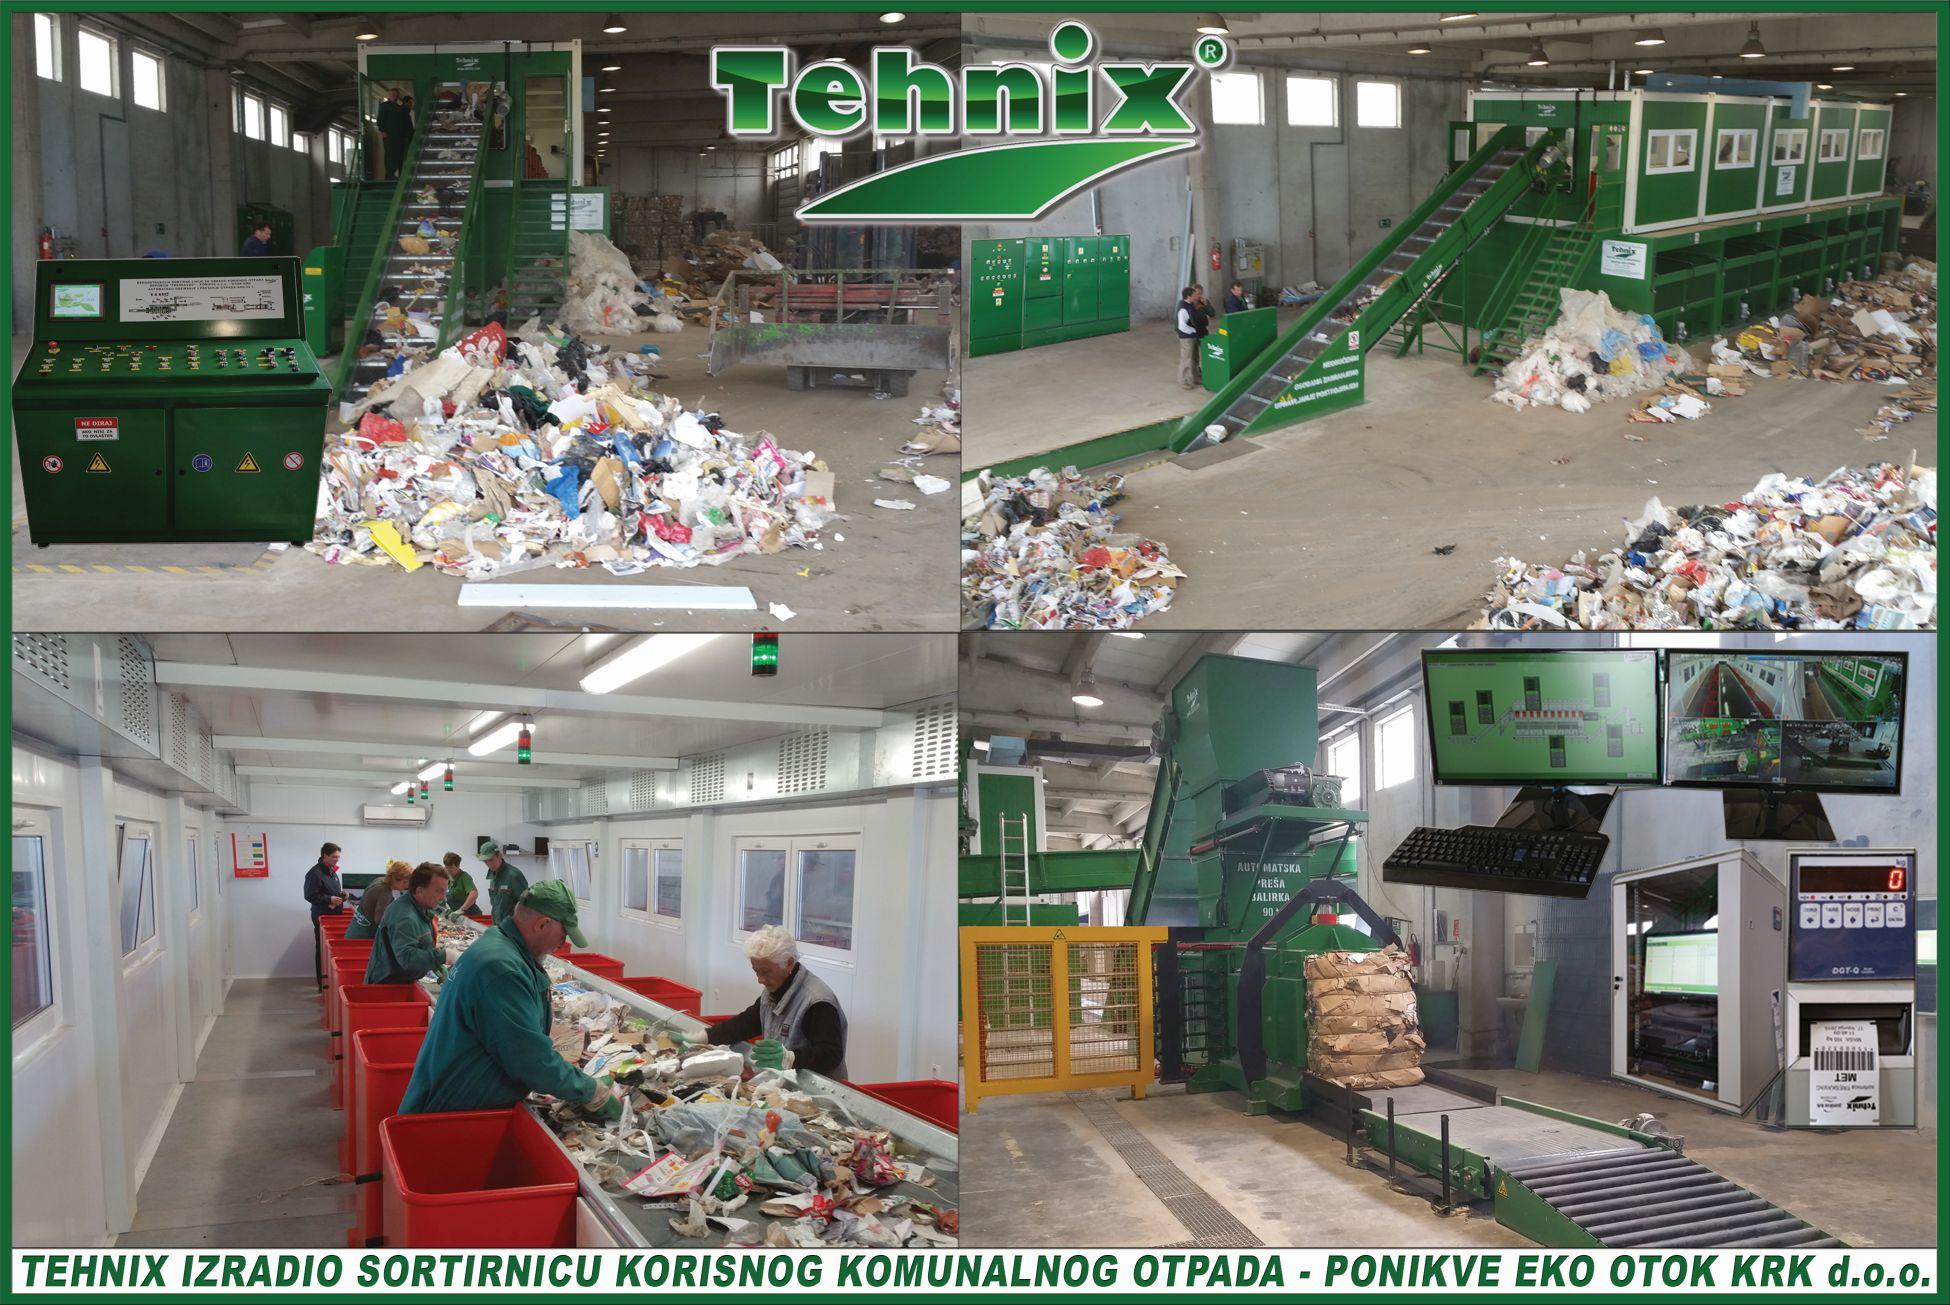 Tehnix izradio sortirnicu korisnog komunalnog otpada – Ponikve eko otok Krk d.o.o.